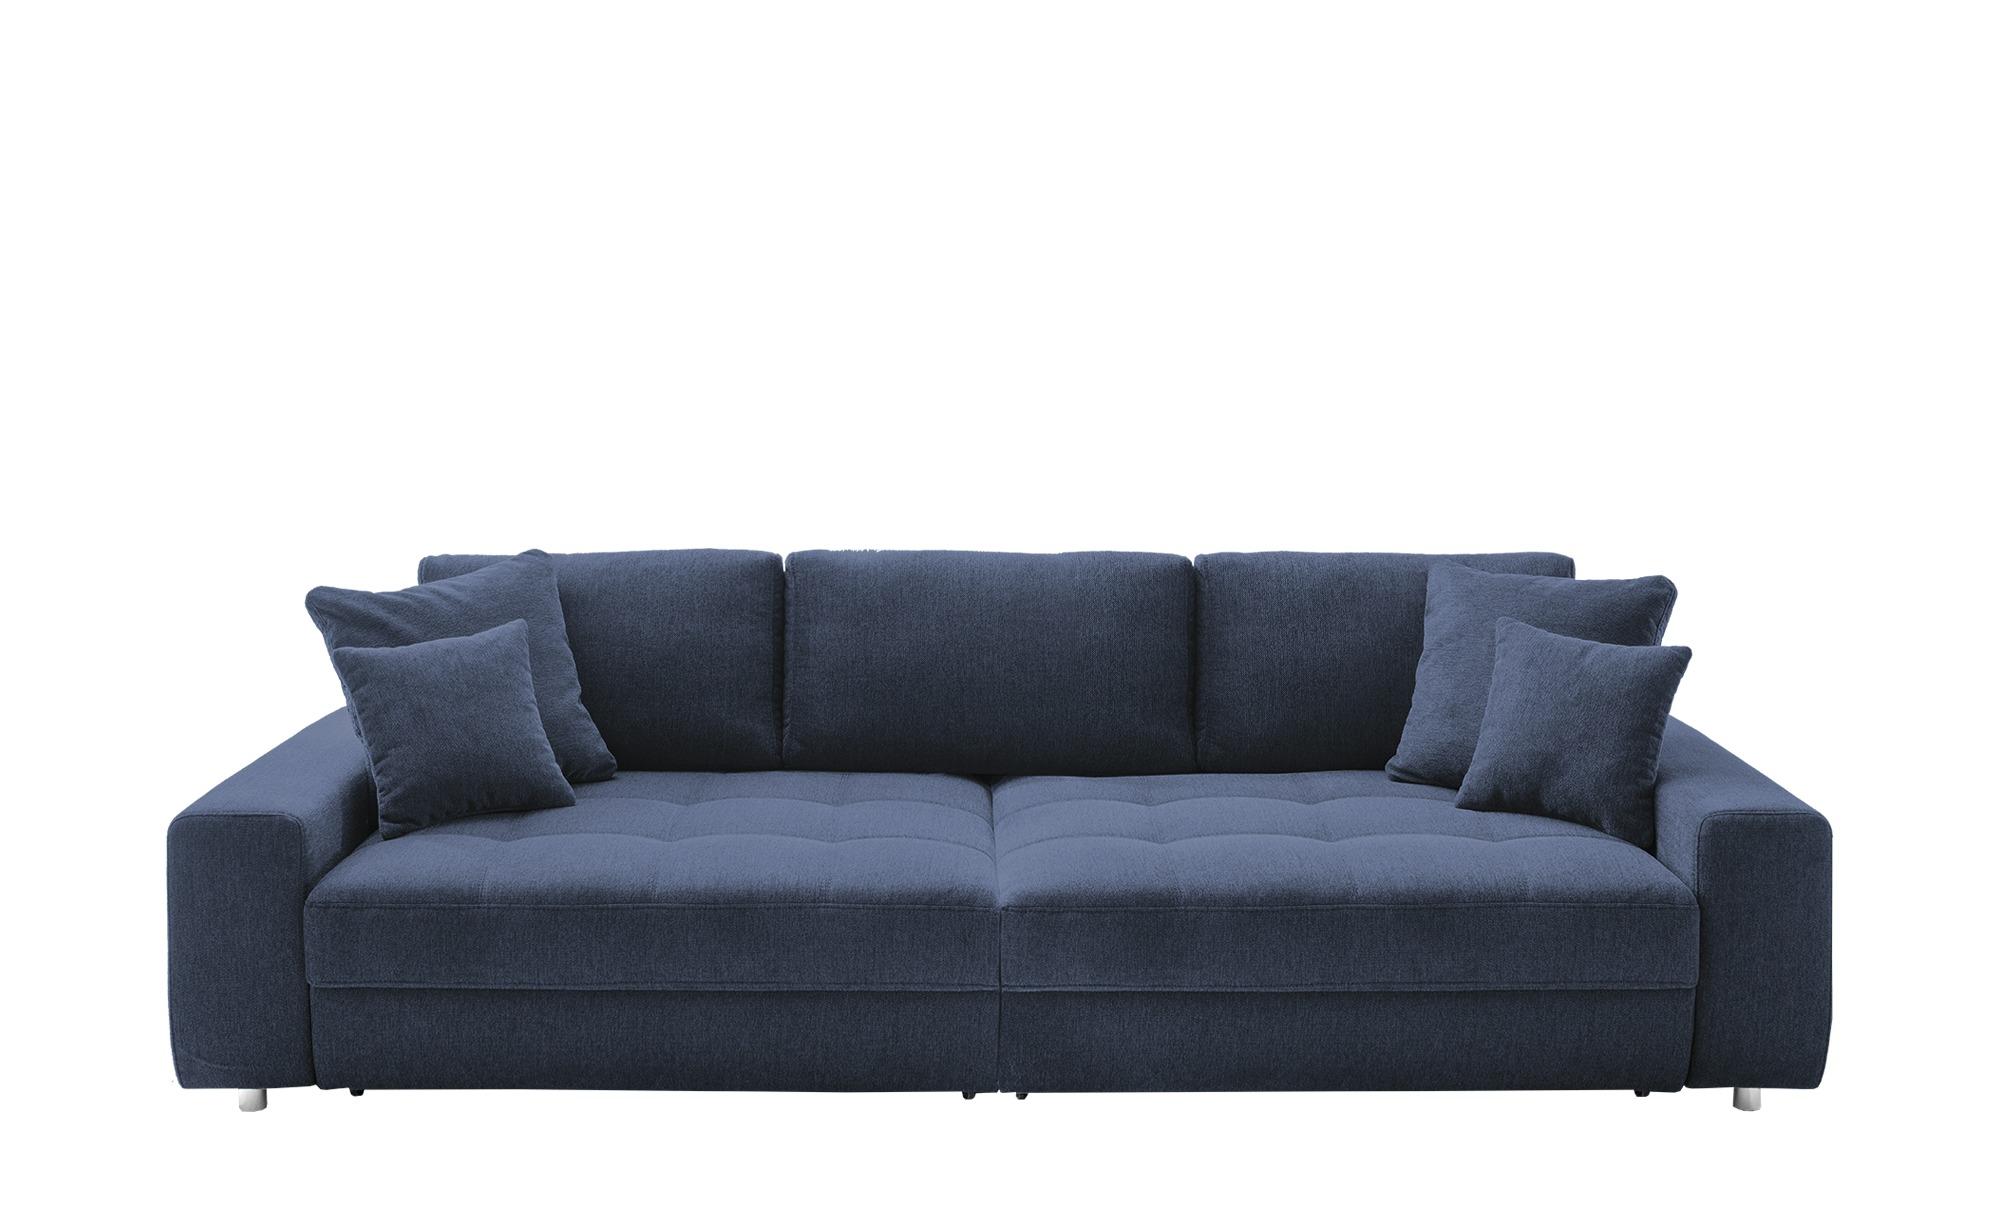 bobb Big Sofa  Arissa de Luxe ¦ blau ¦ Maße (cm): B: 292 H: 84 T: 120 Polstermöbel > Sofas > Big-Sofas - Höffner